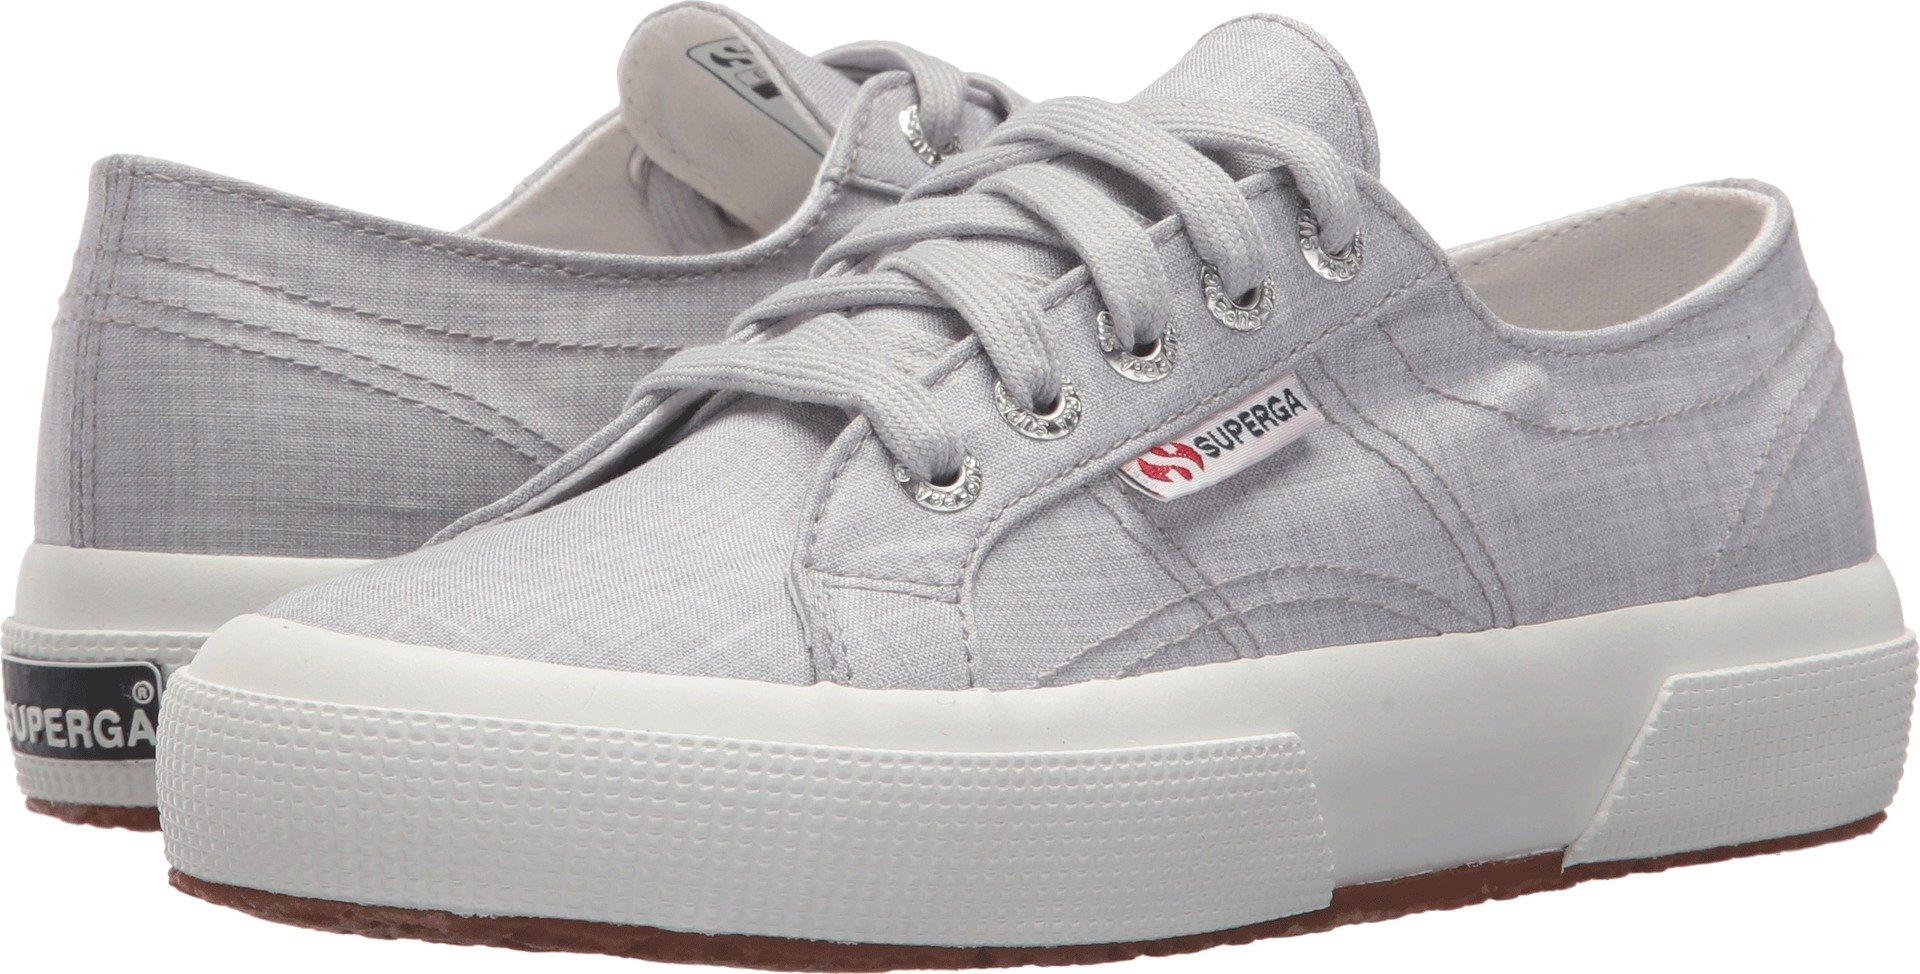 Superga Women's 2750 Fabricshirtu Sneaker, Light Grey, 39 M EU (8 US)